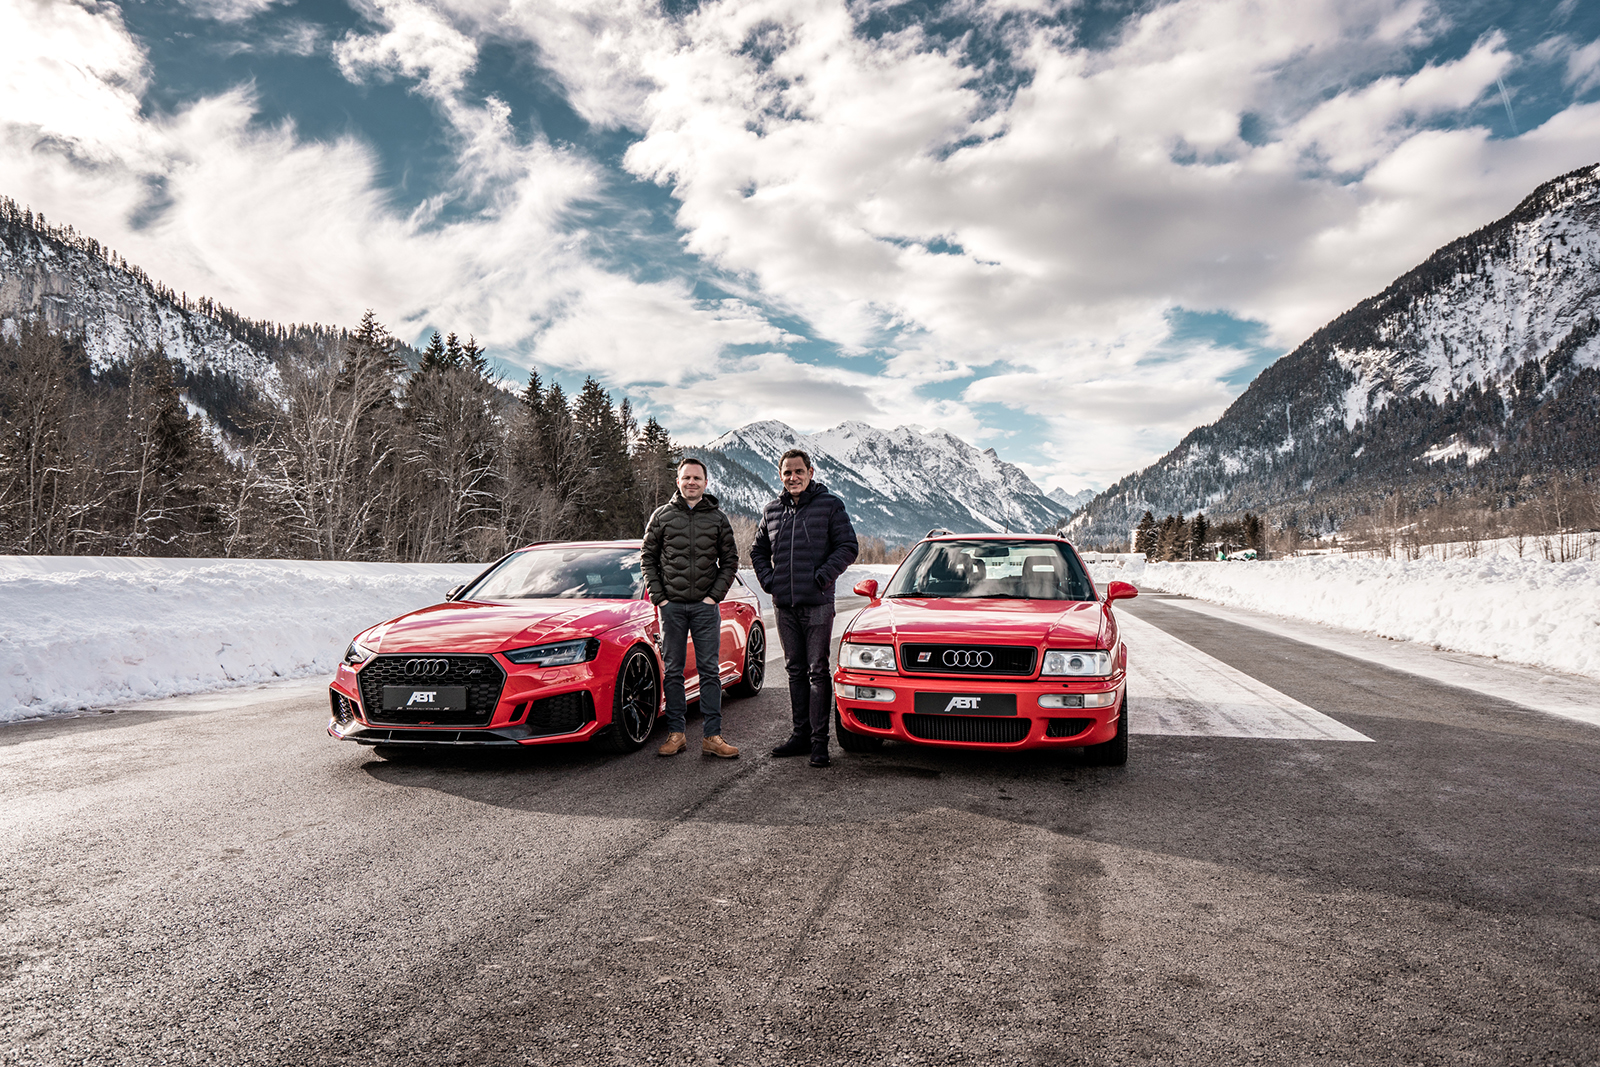 ABT_RS4+_Audi_RS2_11_Rolf_Michl_ABT_Hans-JÅrgen_Abt